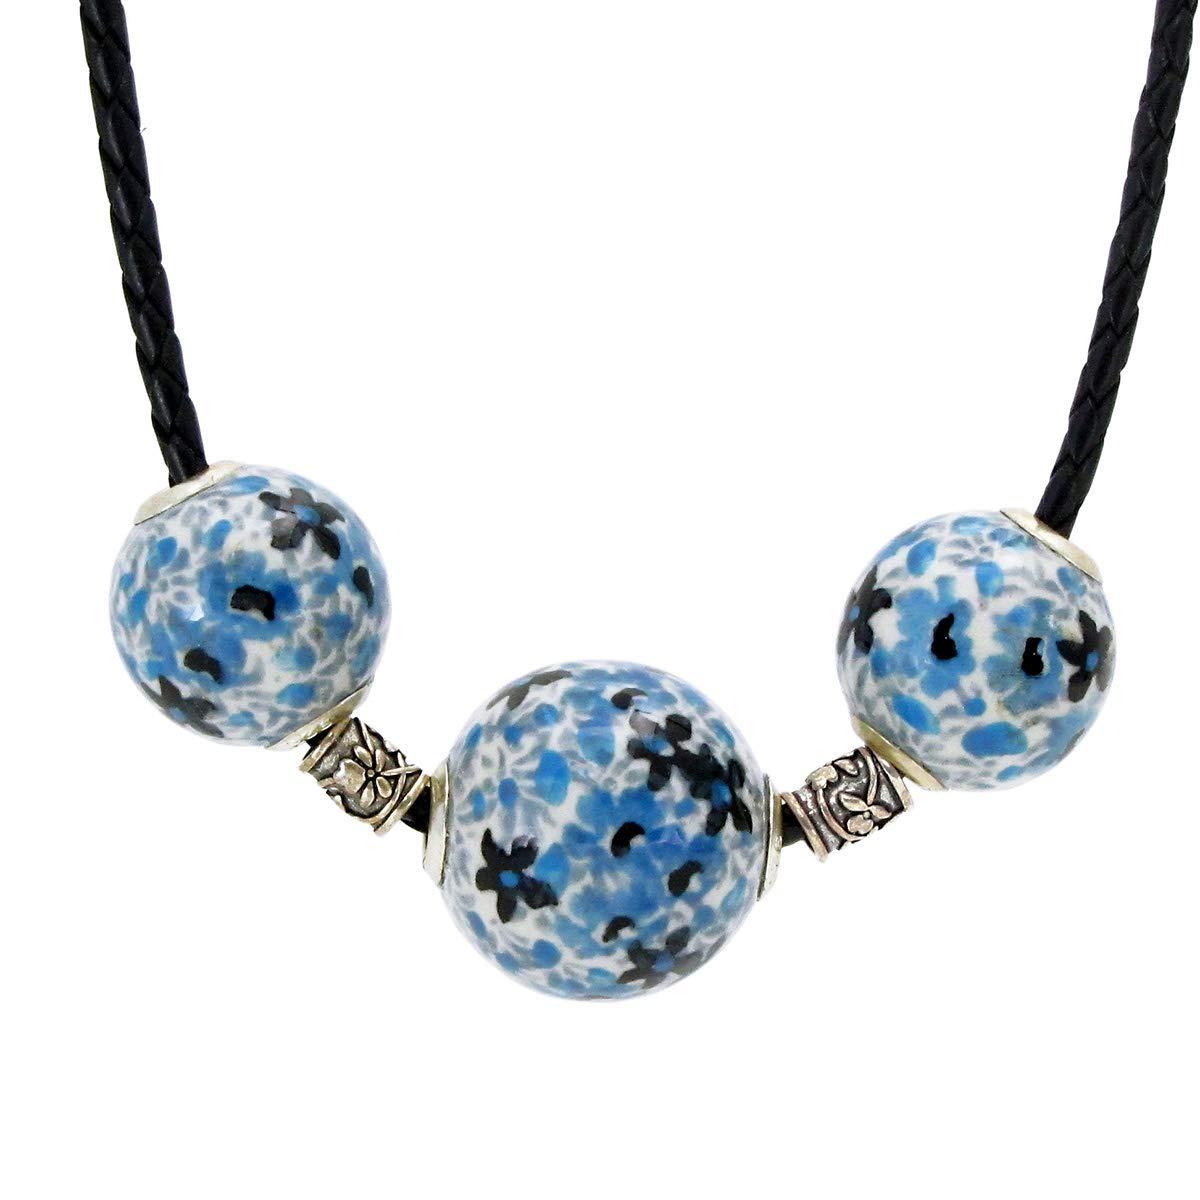 Kamionka Polish Pottery Jewelry 18 Bead Trio ON Braided Leather-Light Blue